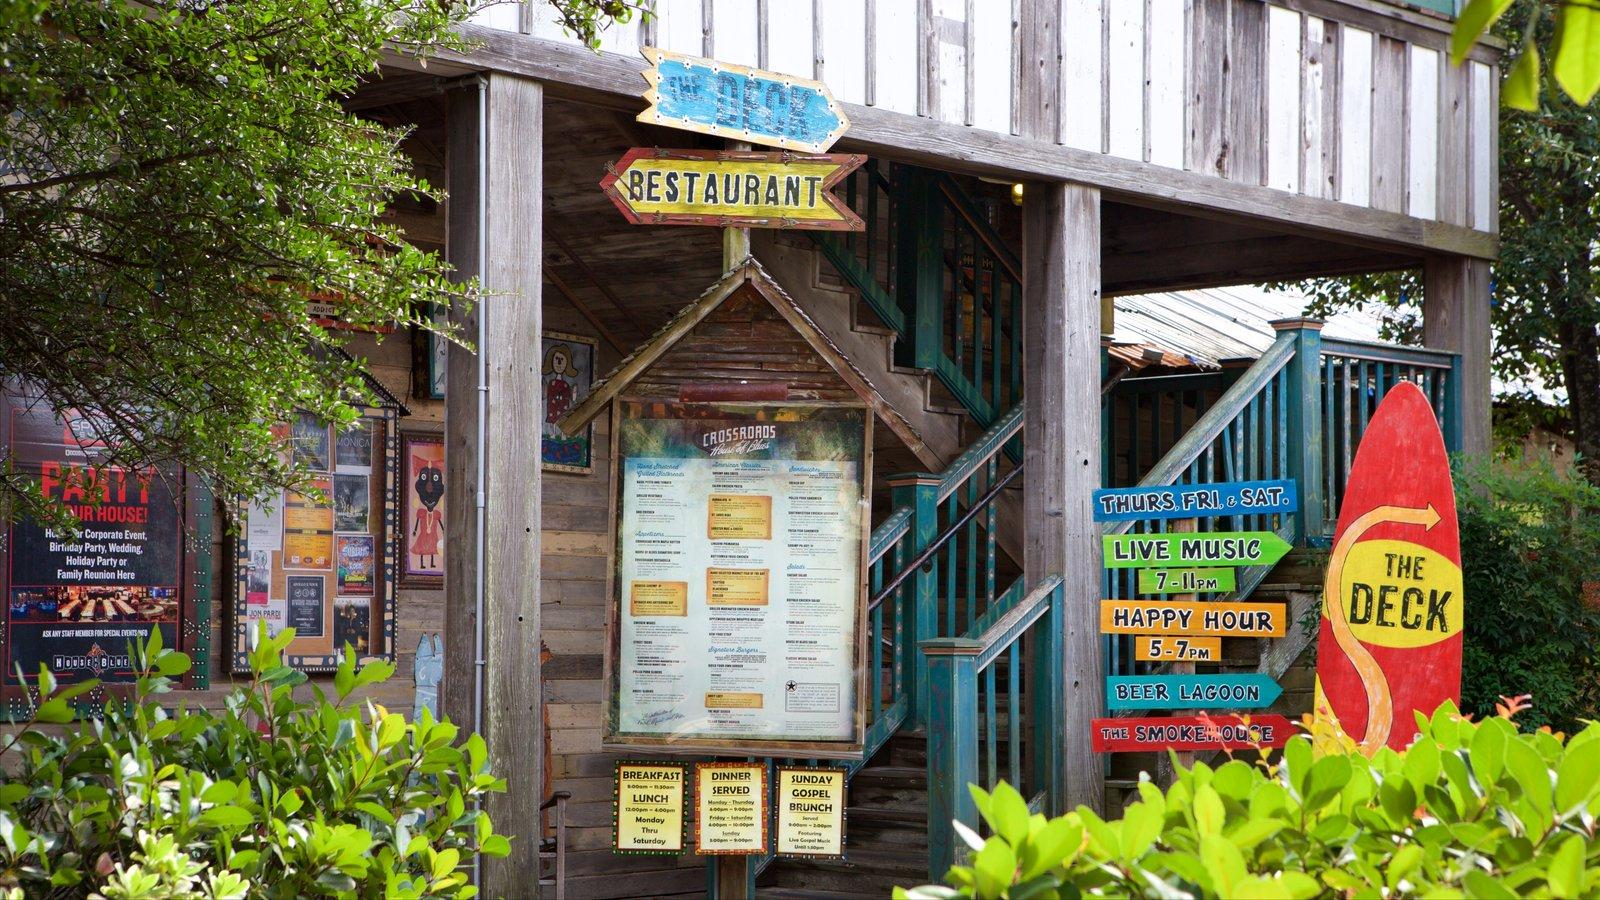 House of Blues Myrtle Beach caracterizando sinalização